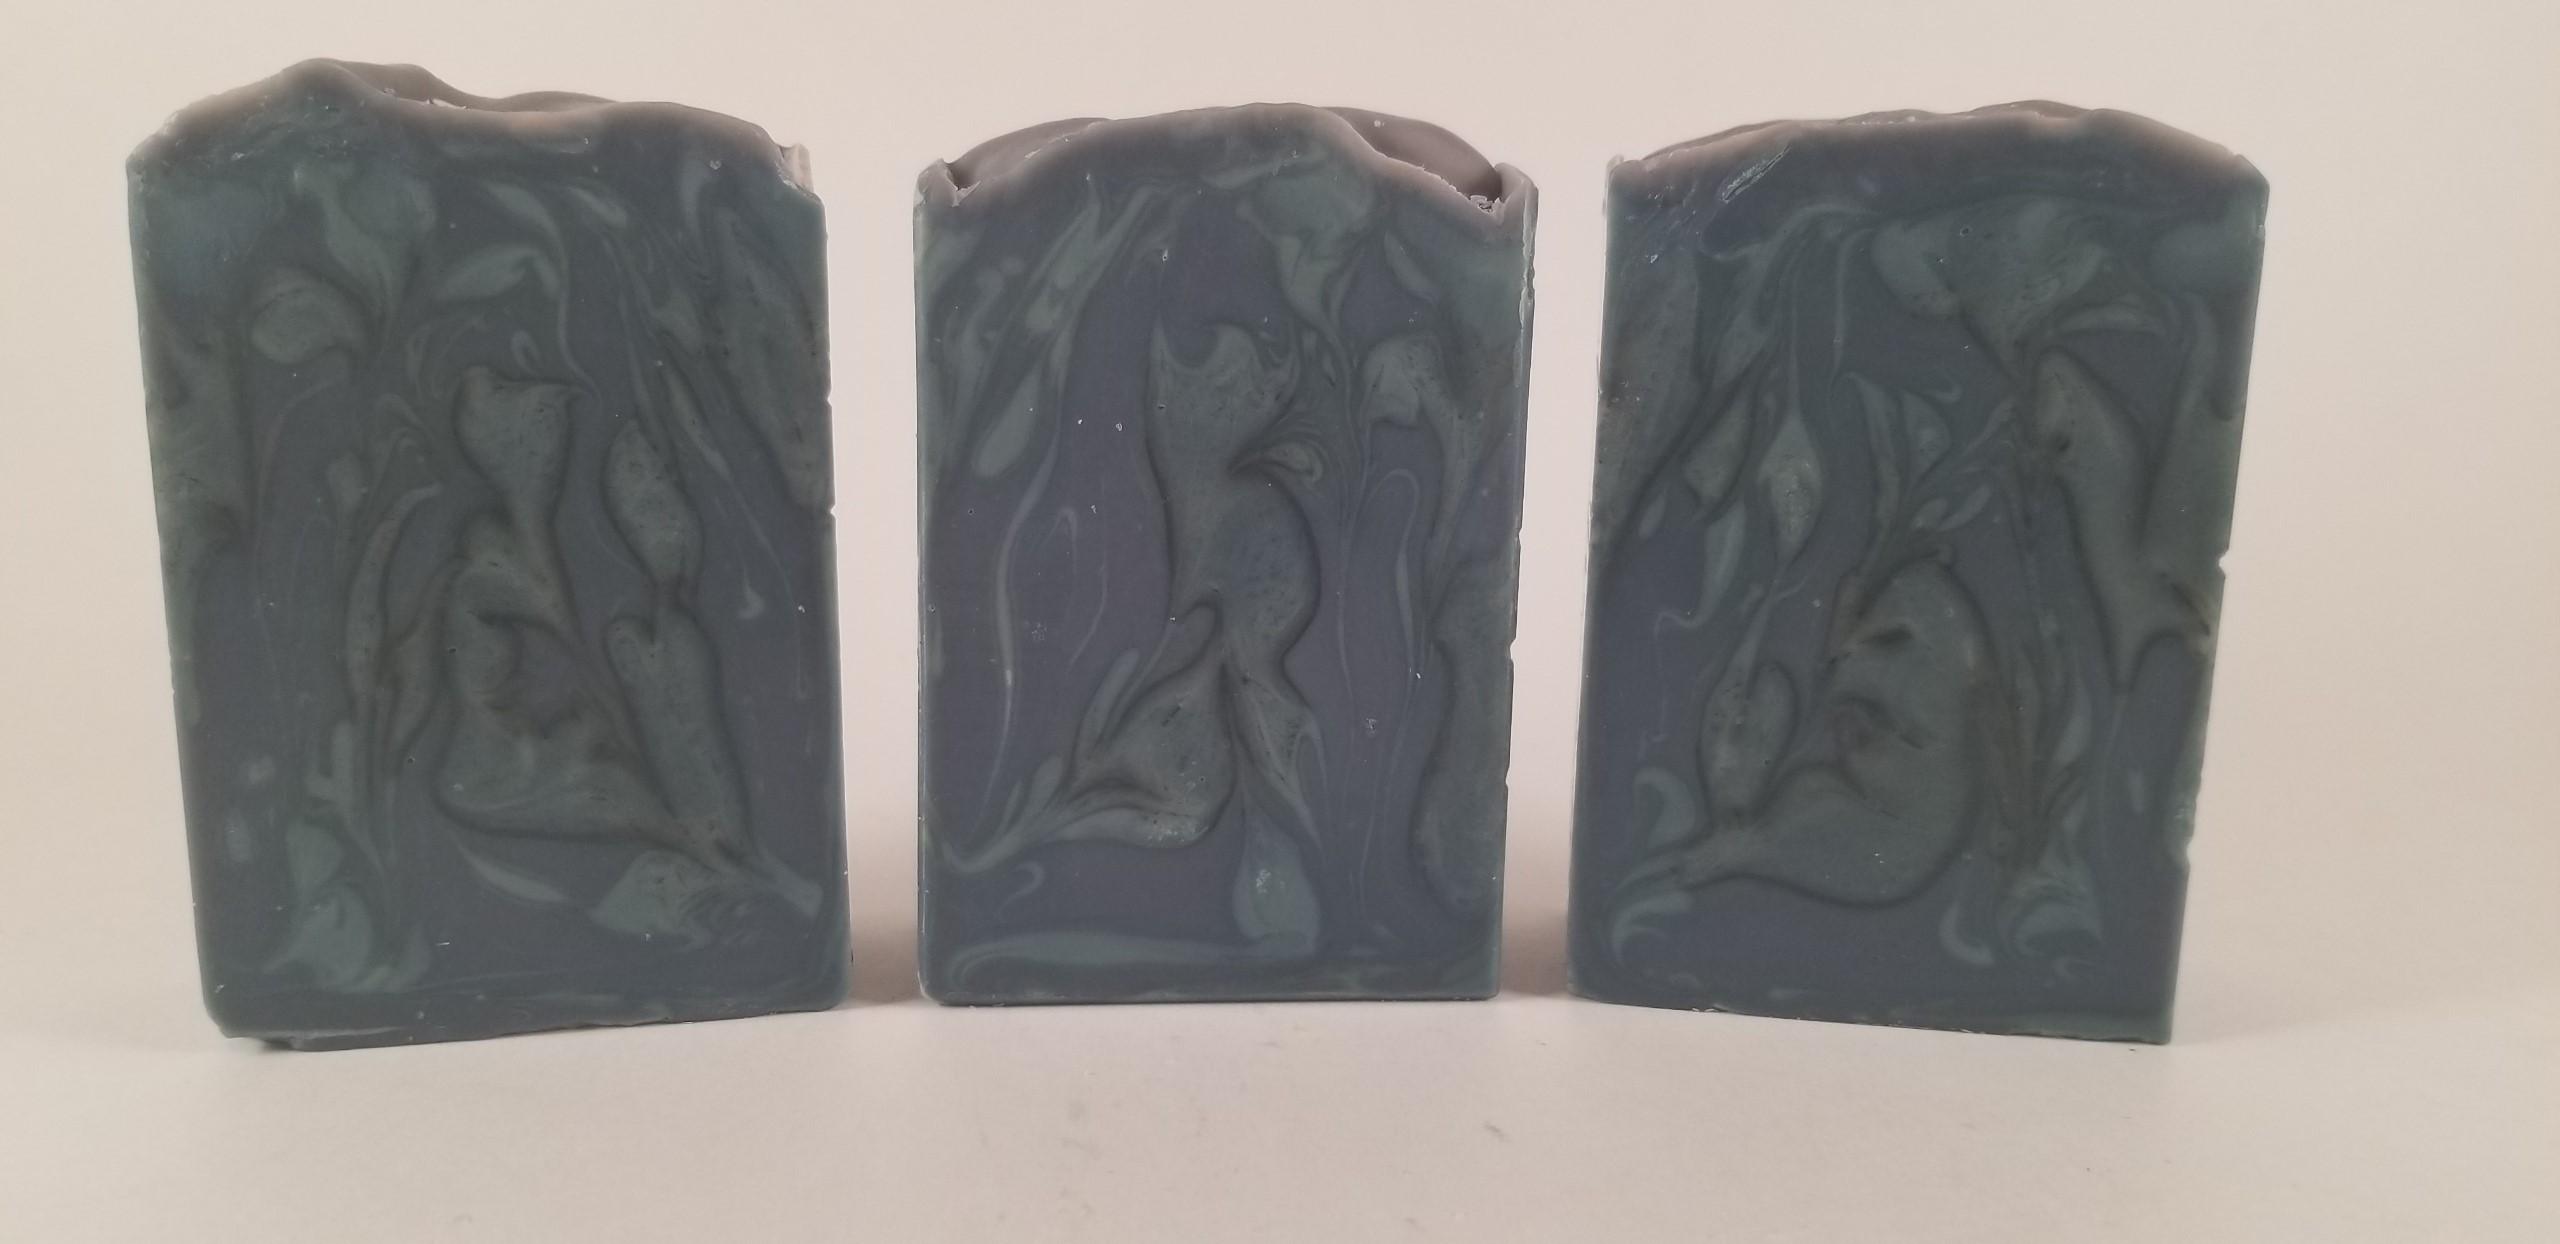 apparitions of indigo